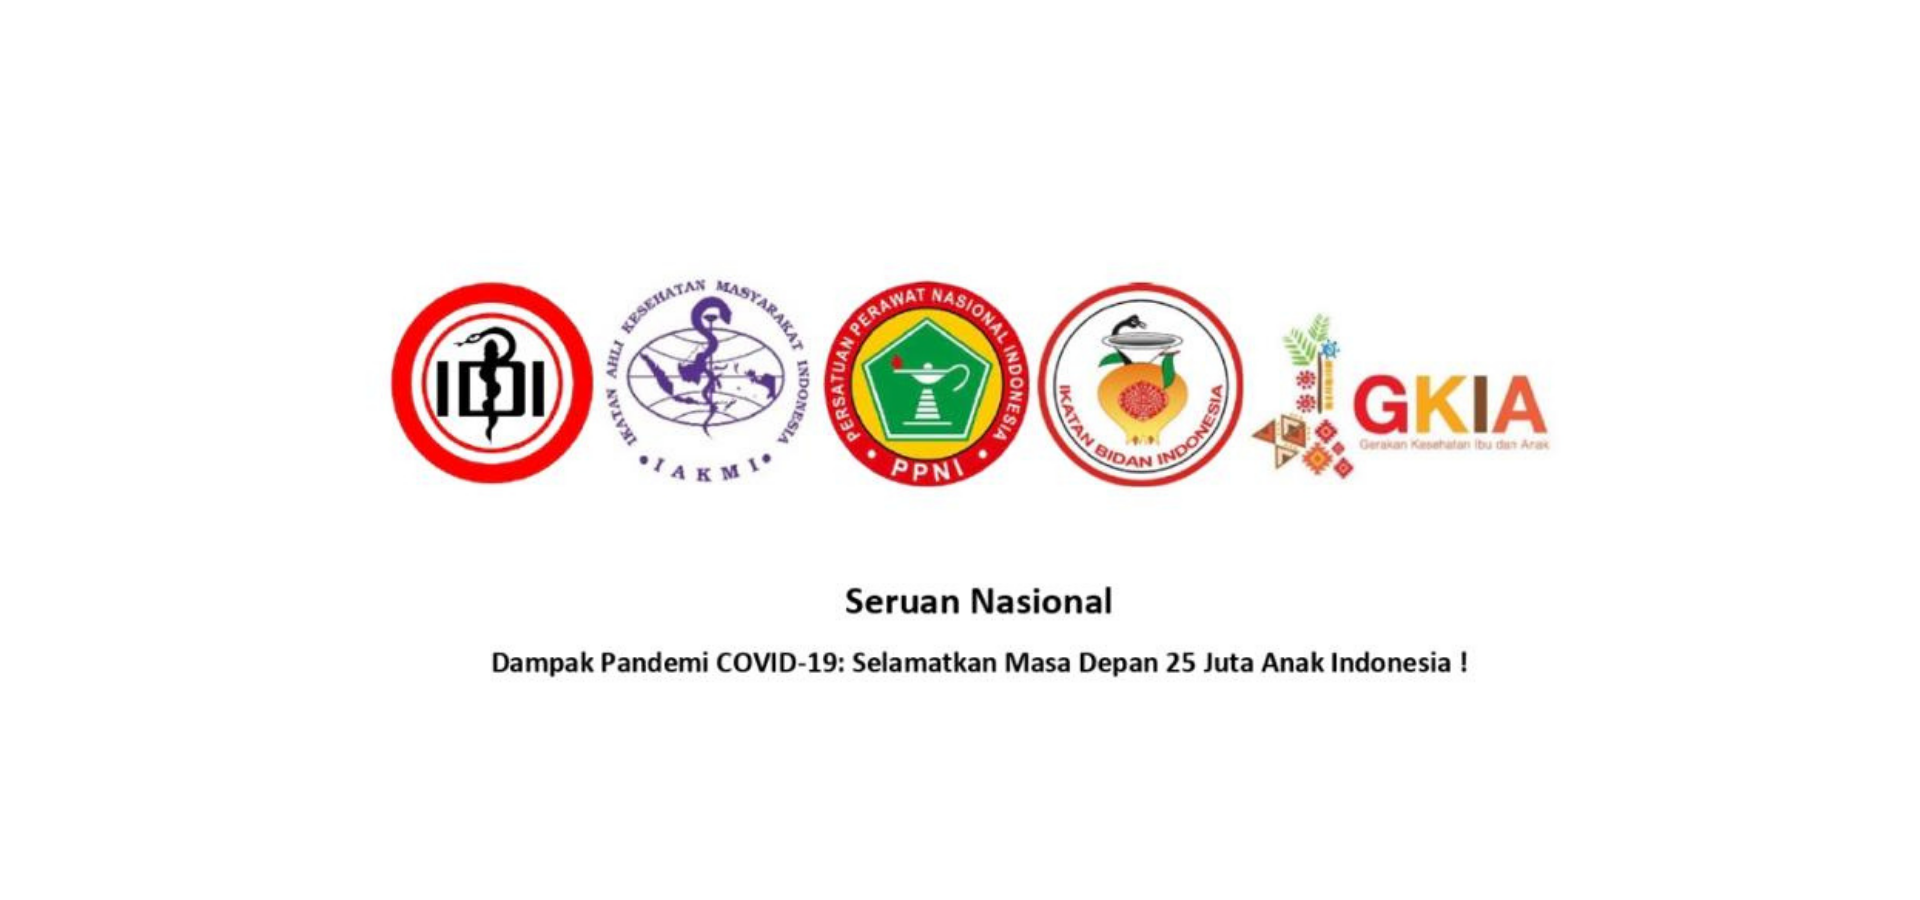 Seruan Nasional Dampak Pandemi COVID-19: Selamatkan Masa Depan 25 Juta Anak Indonesia !